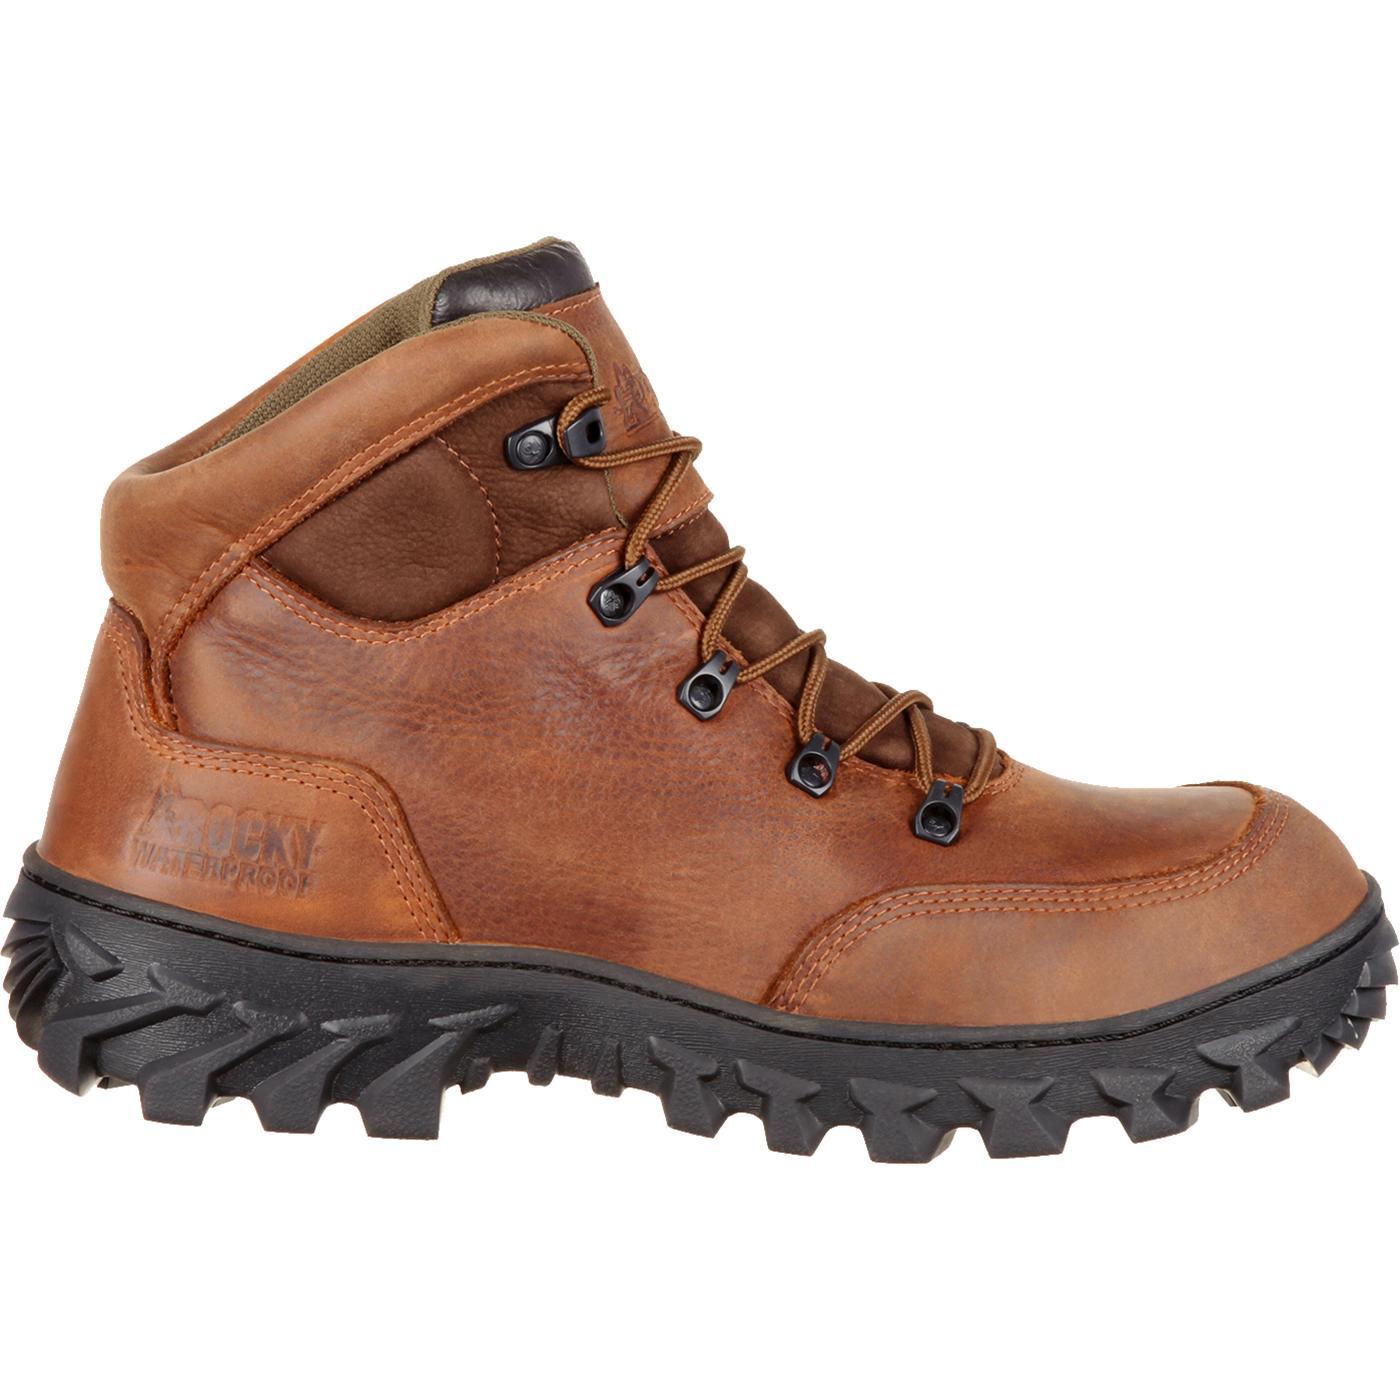 8f9e4b03b40 Rocky S2V Composite Toe Waterproof Work Boot